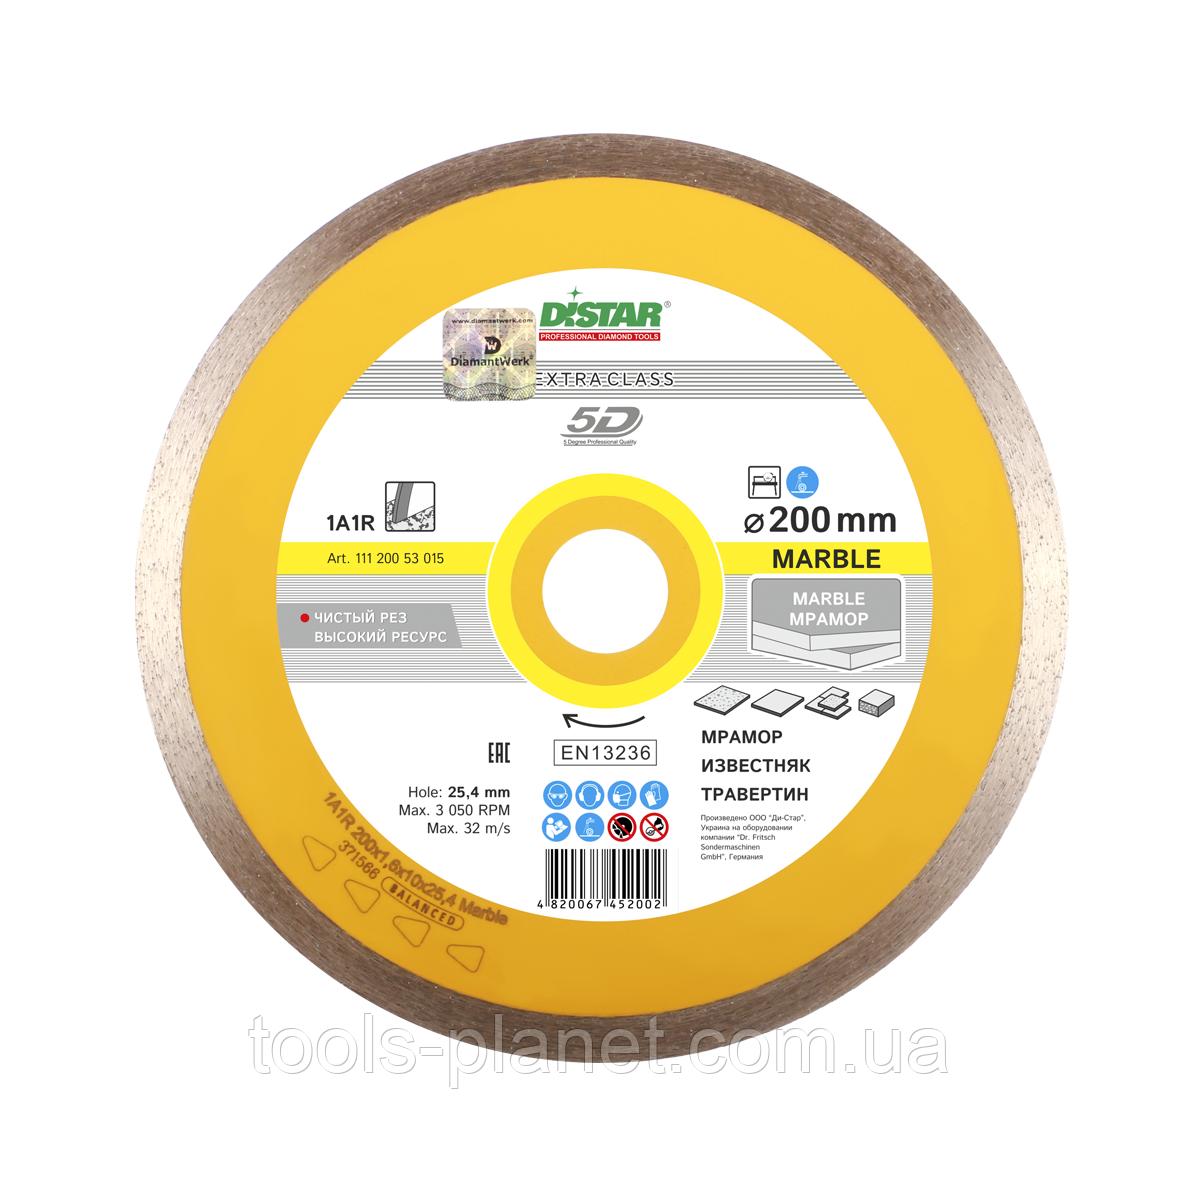 Алмазный диск Distar 1A1R 200 x 1,6 x 10 x 25,4 Marble 5D (11120053015)